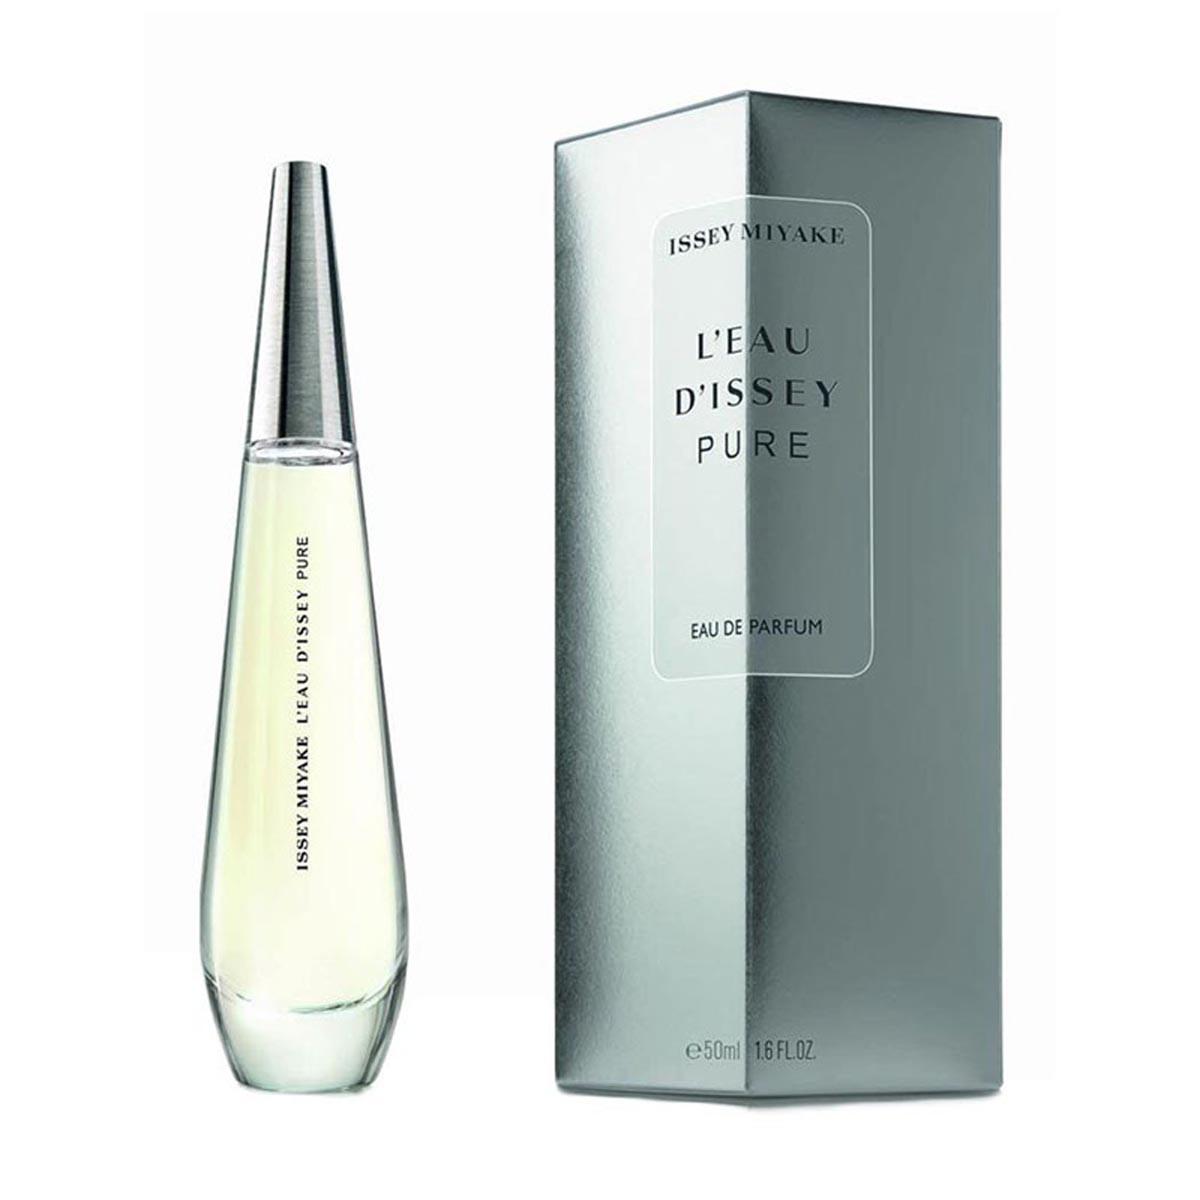 Issey miyake l eau d issey pure eau de parfum 50ml vaporizador